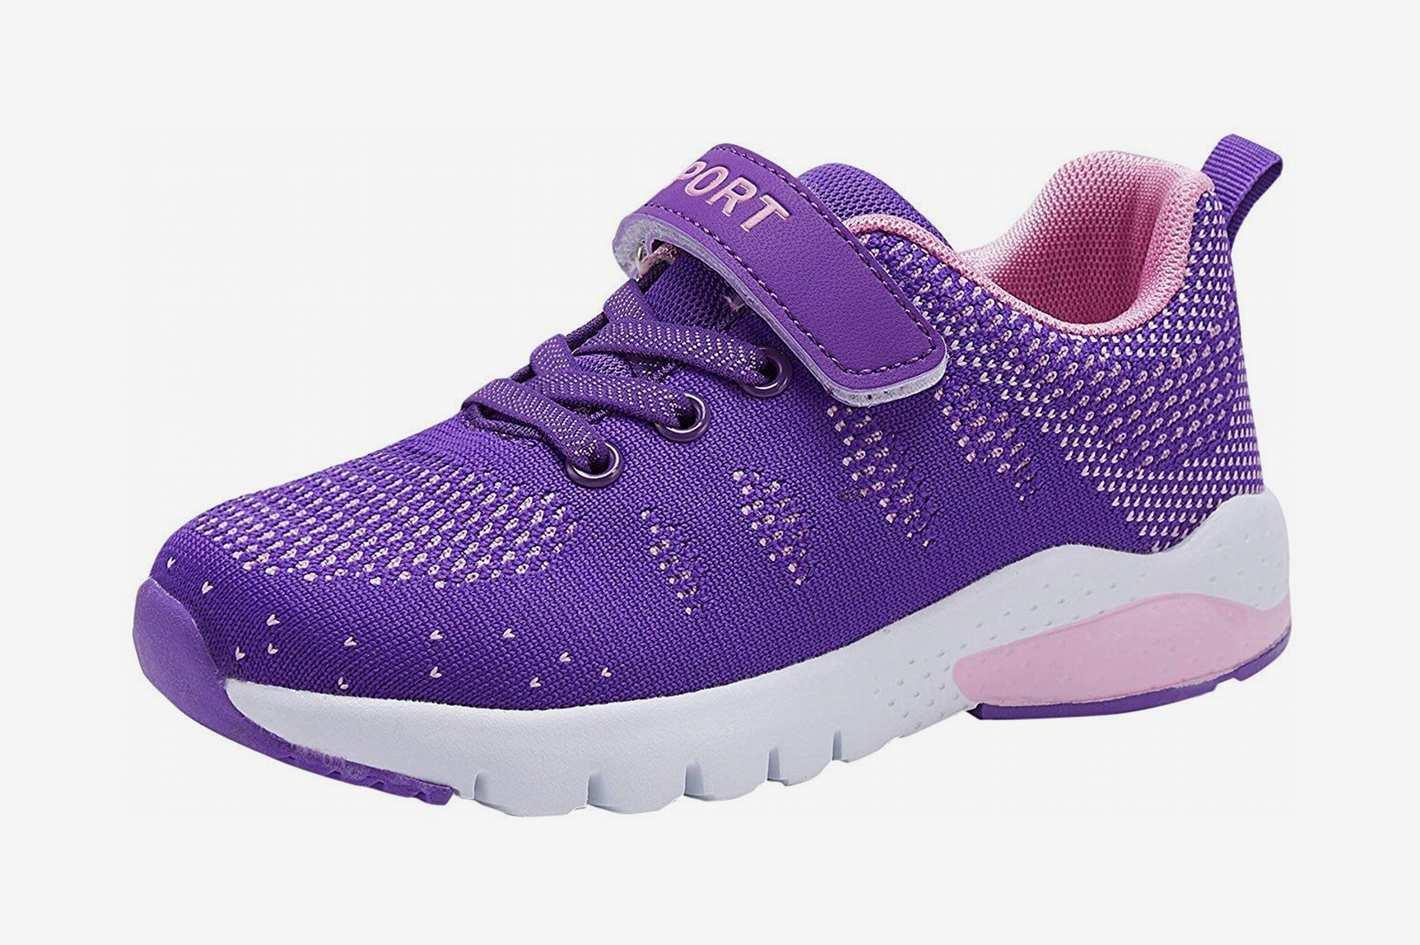 Caitin Kids Running Tennis Shoes Lightweight Casual Walking Sneakers